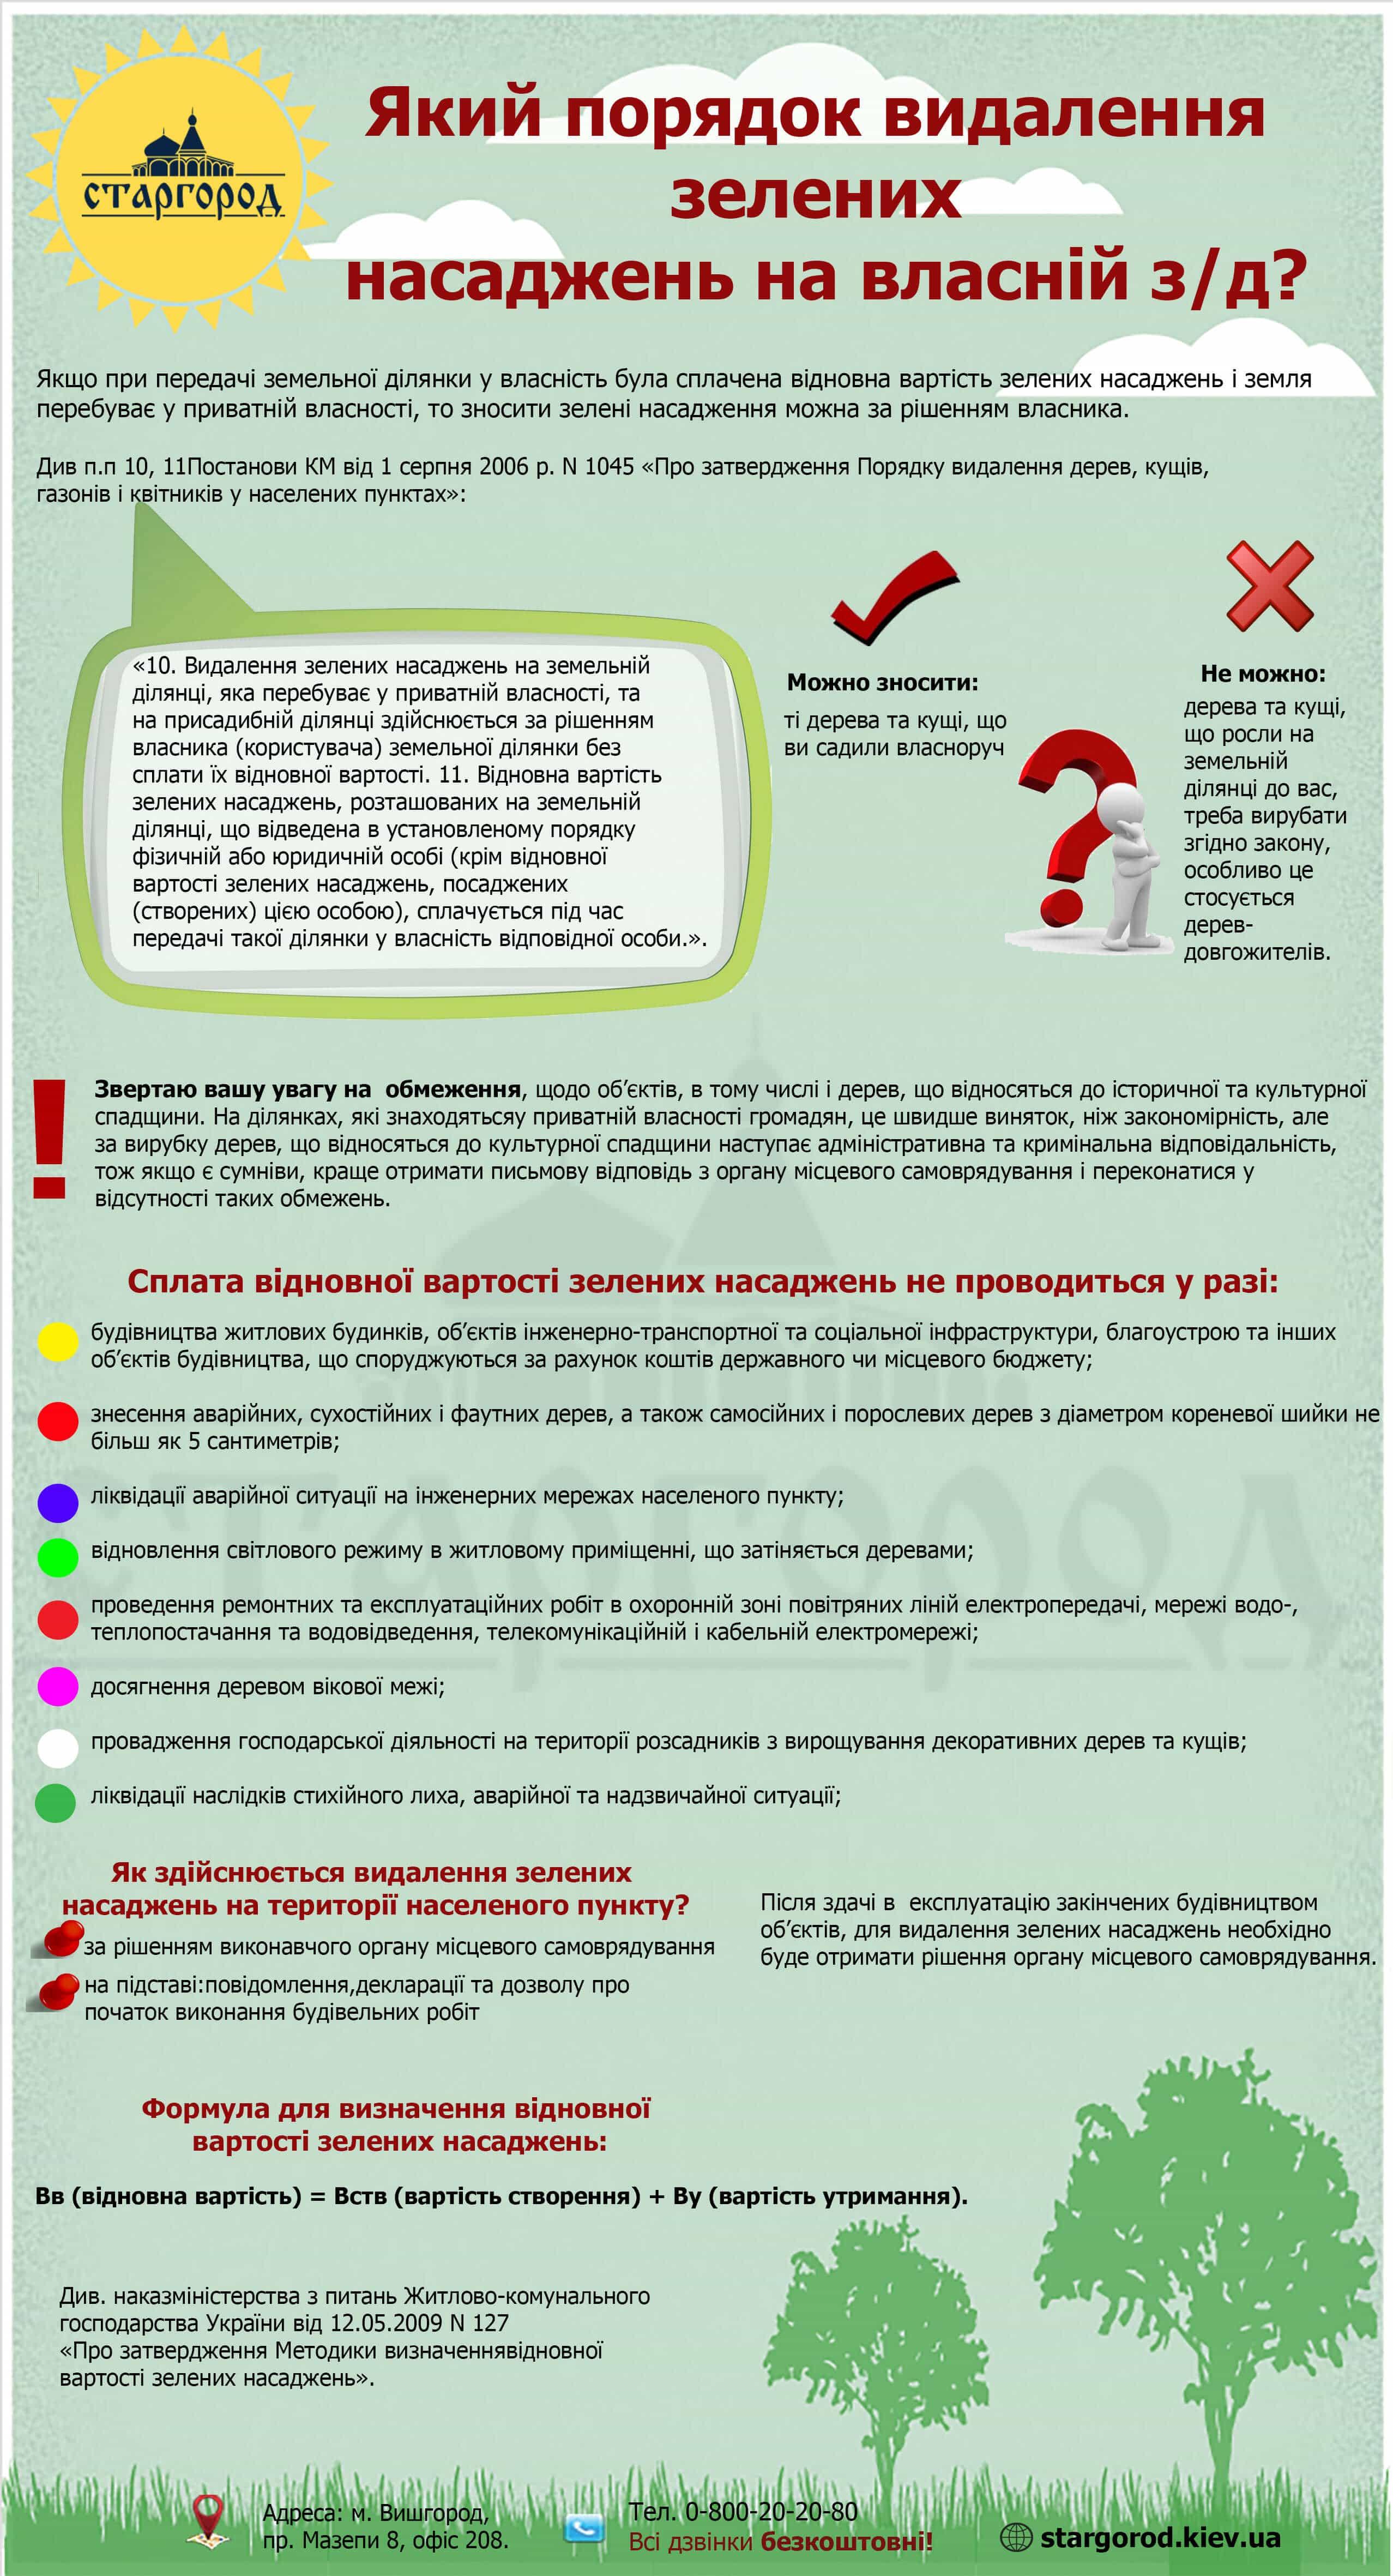 знесення зелених насаджень Україна